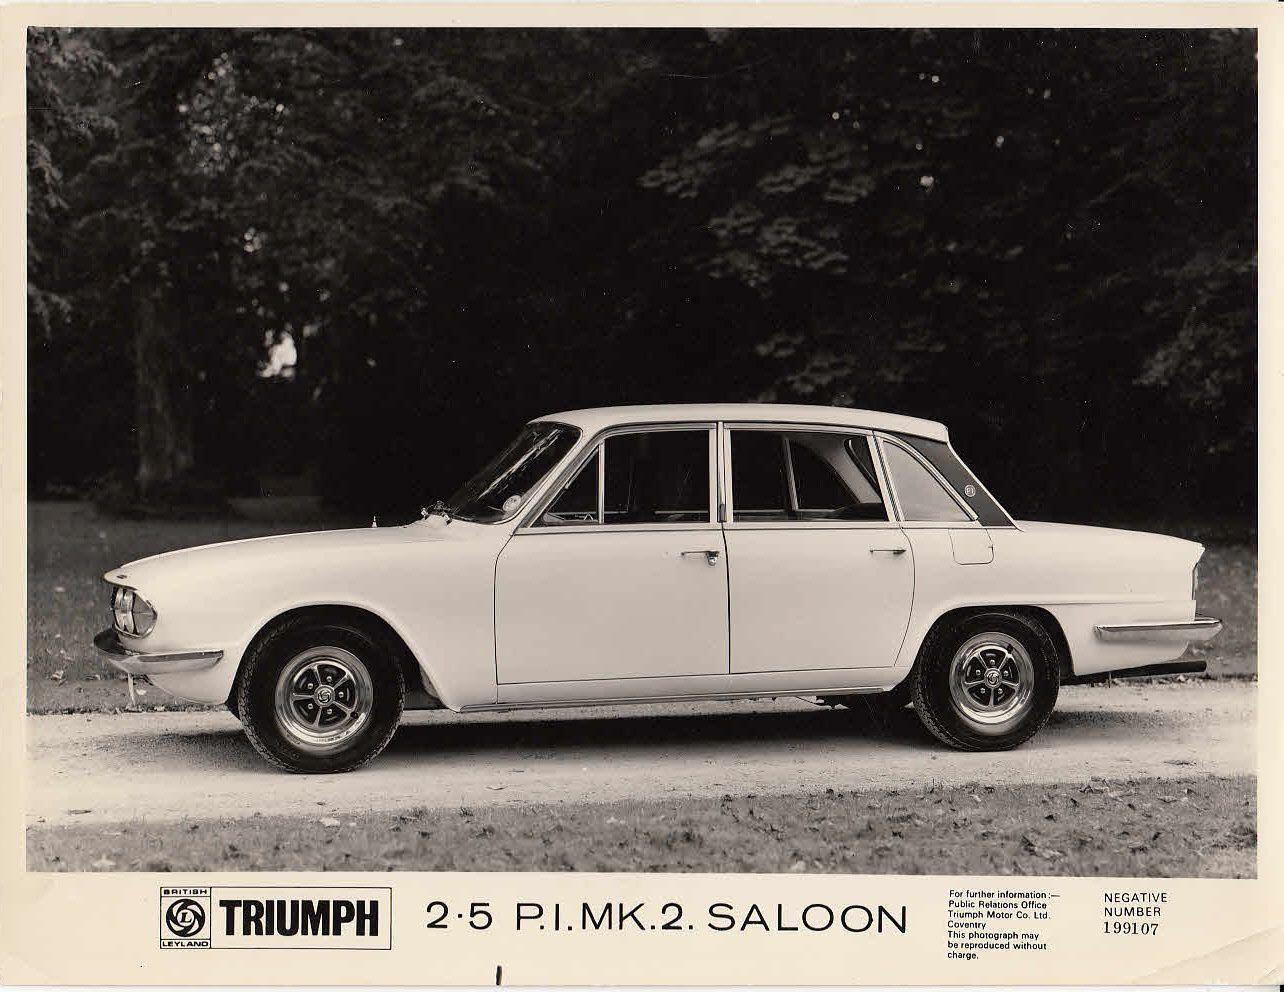 1970 TRIUMPH 2.5 PI Mark 2 British Leyland UK Brochure